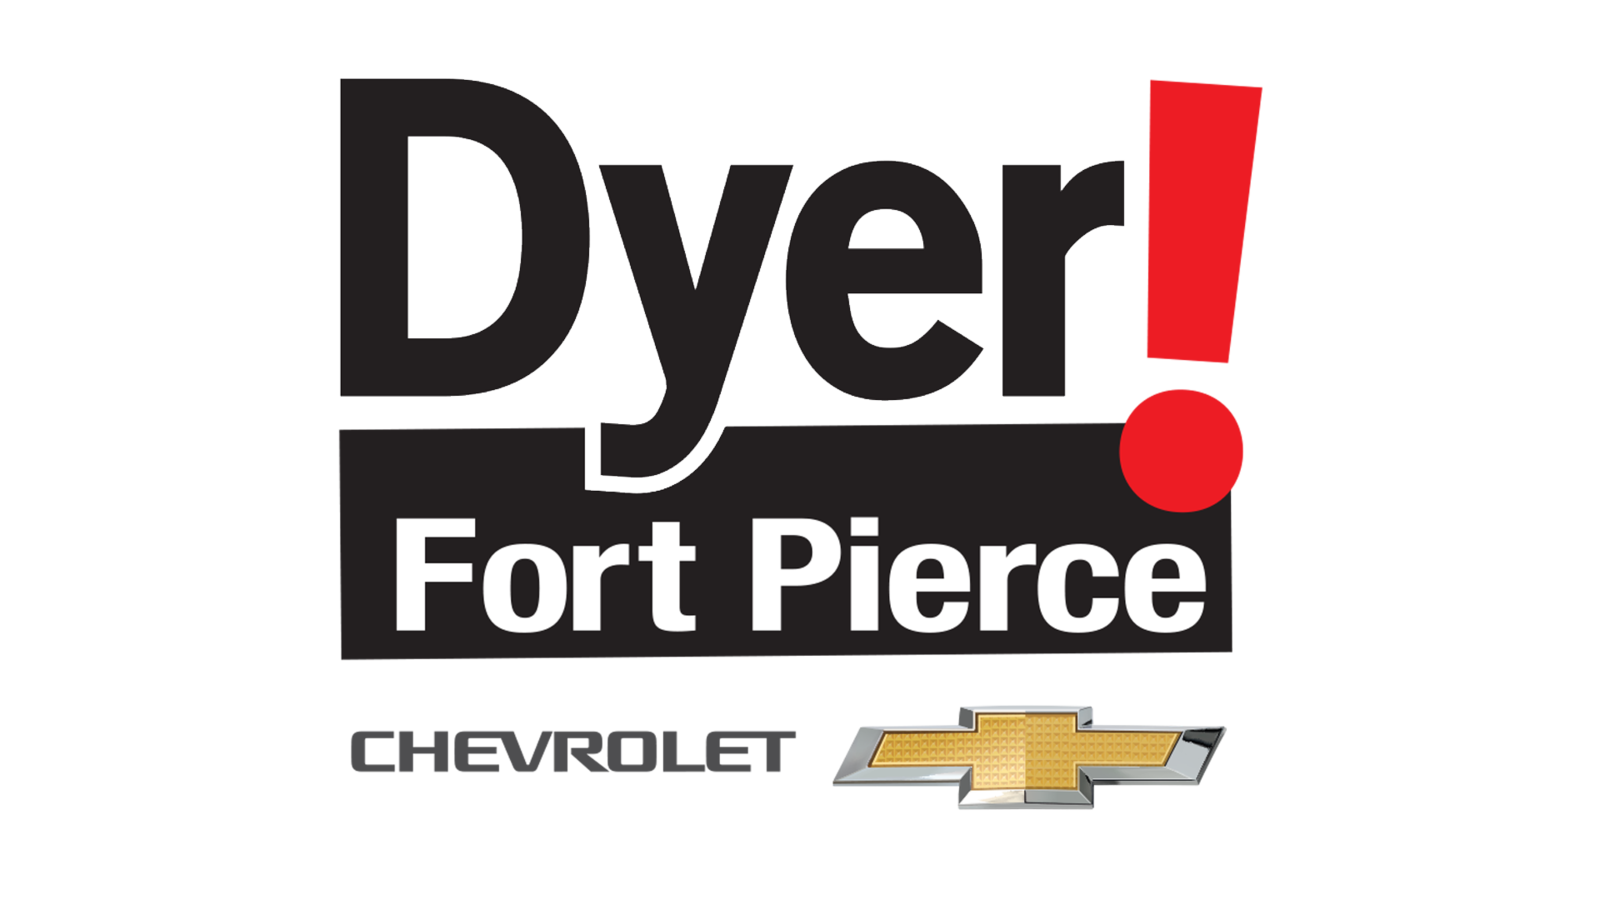 BMW Fort Pierce >> Dyer Chevrolet Fort Pierce - Fort Pierce, FL: Read ...